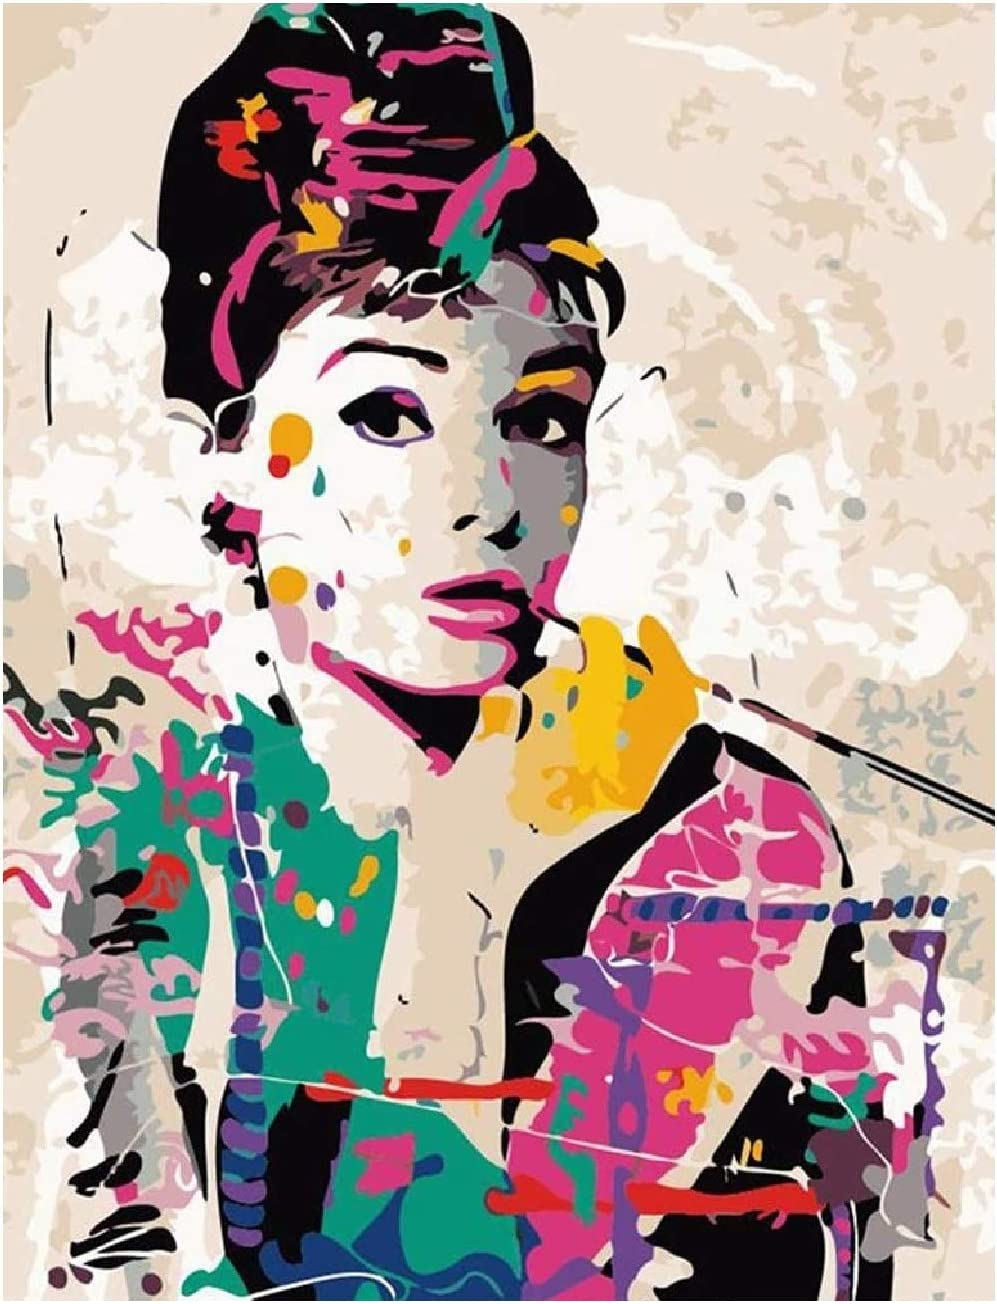 pintura por numero + atril + kit pintura, 41 x 51 cm Audrey